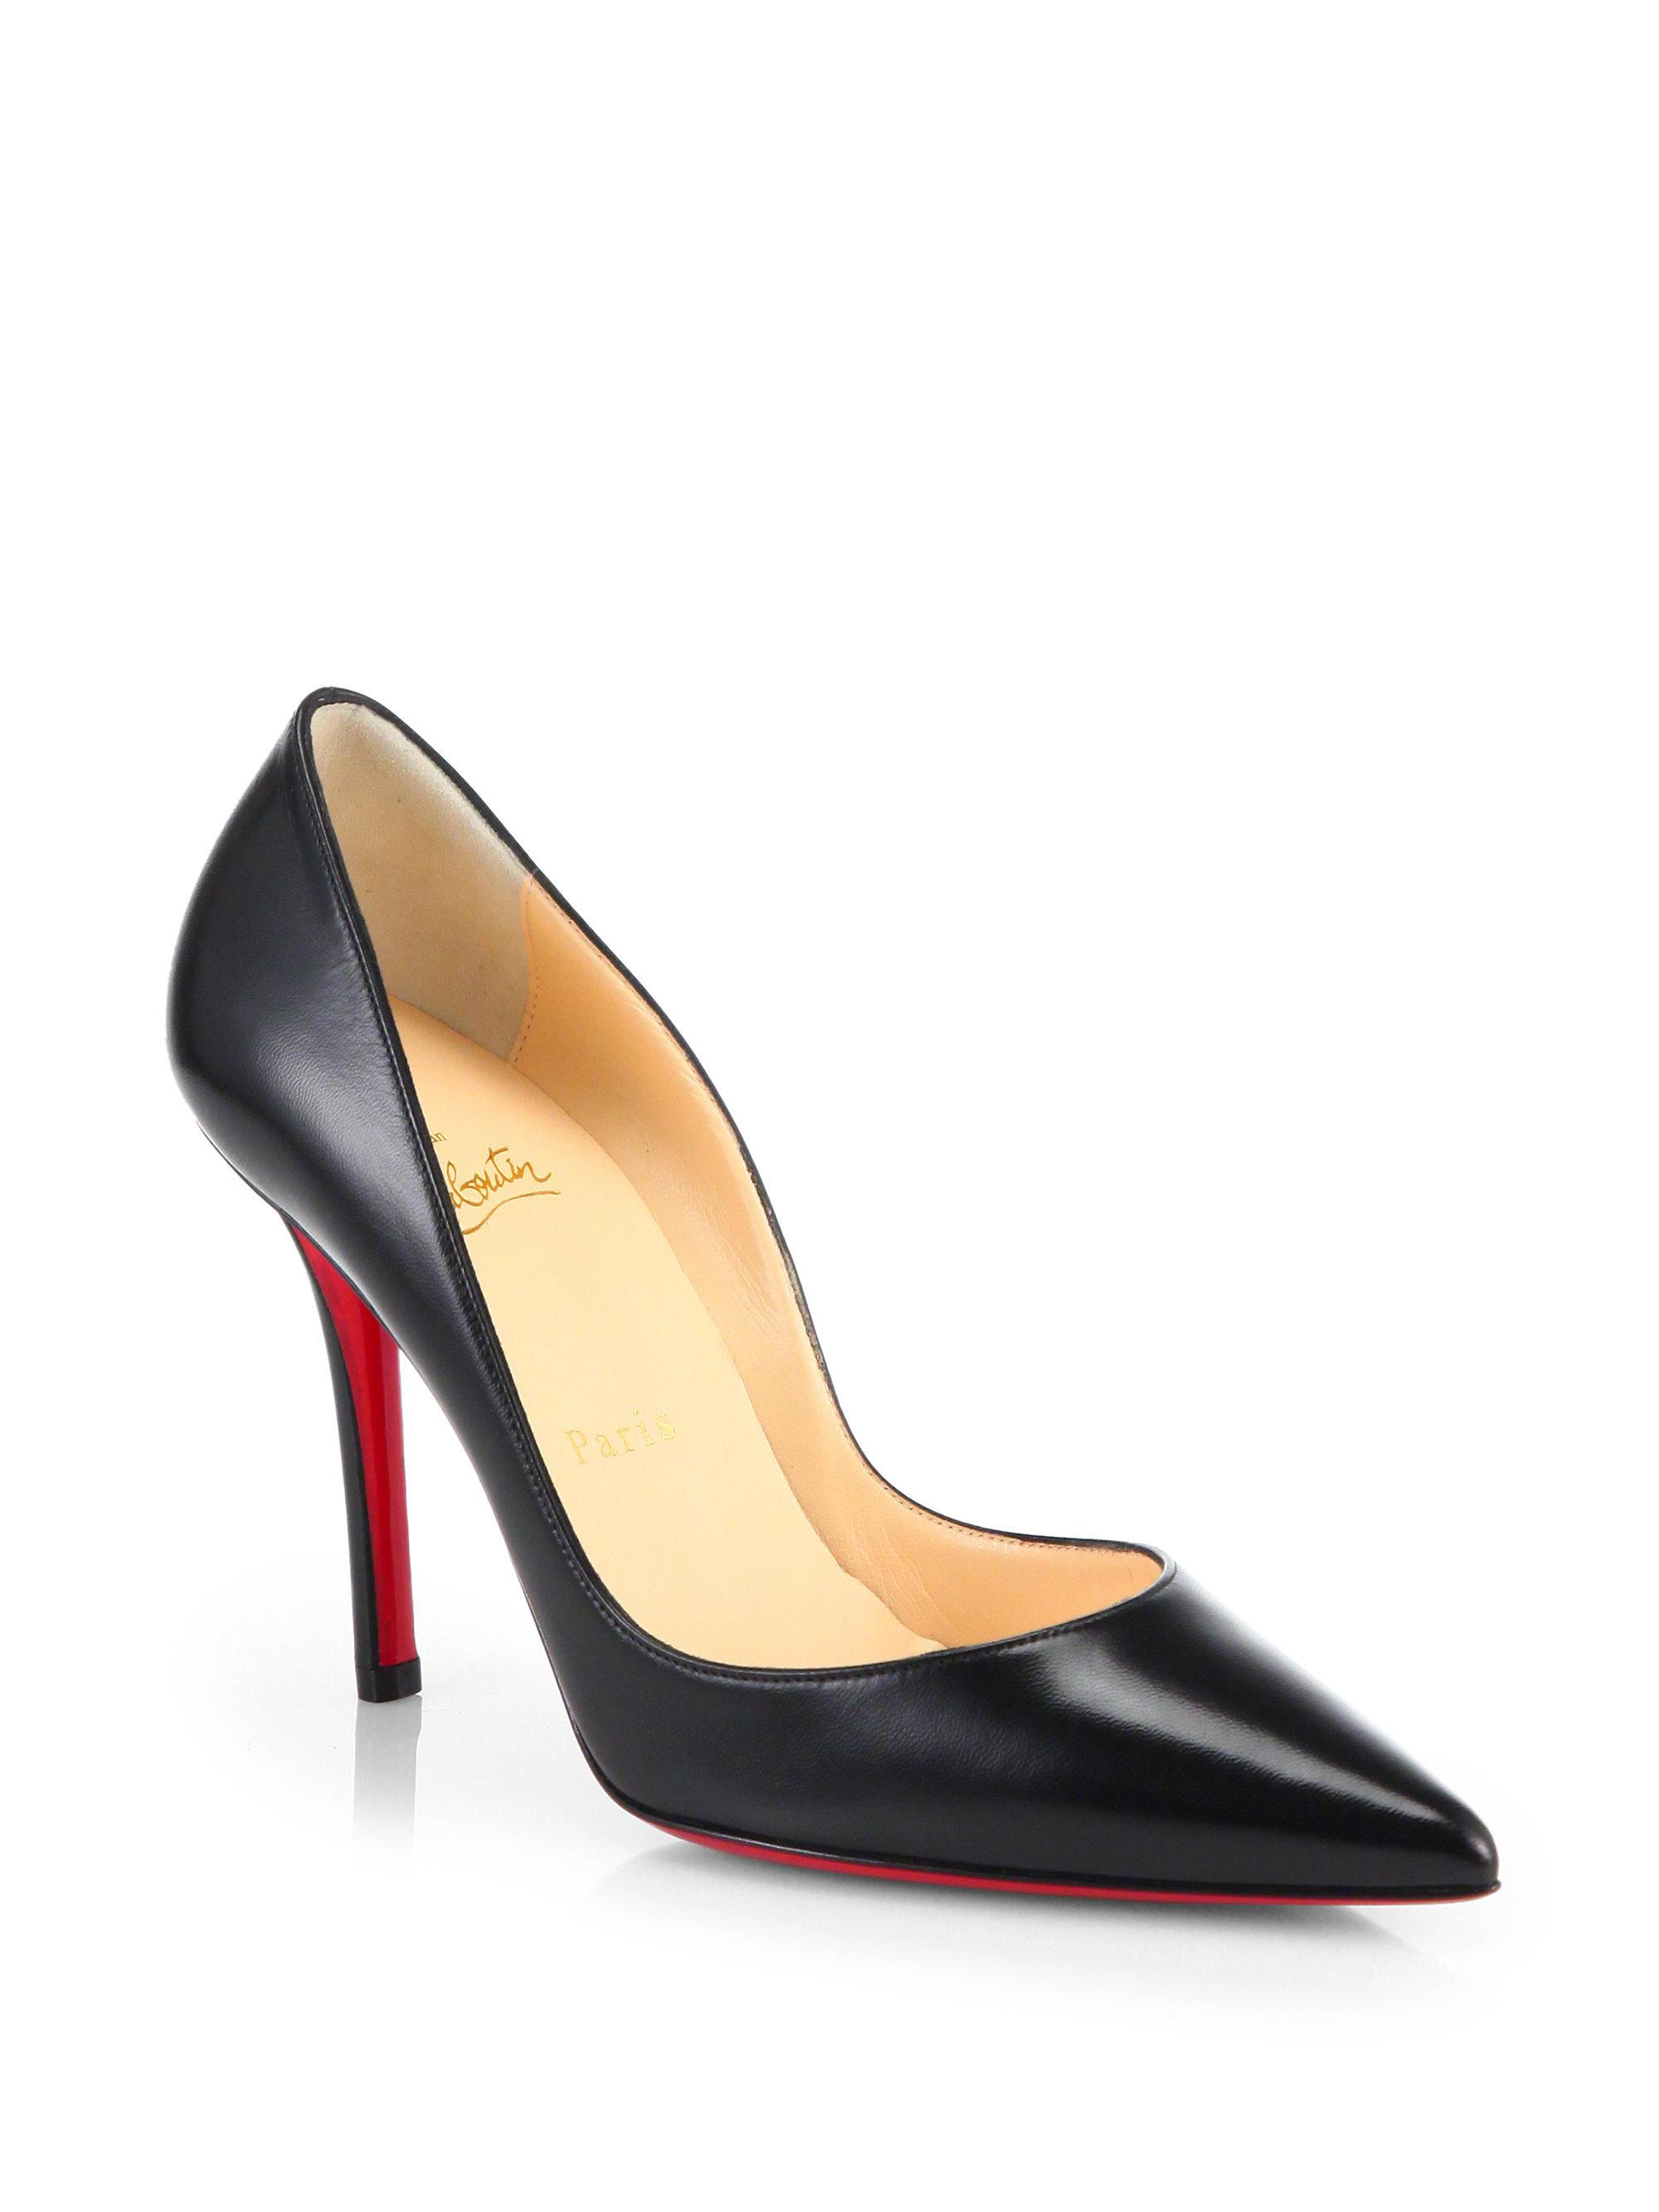 christian louboutin peep-toe wedges Black leather cork covered ...